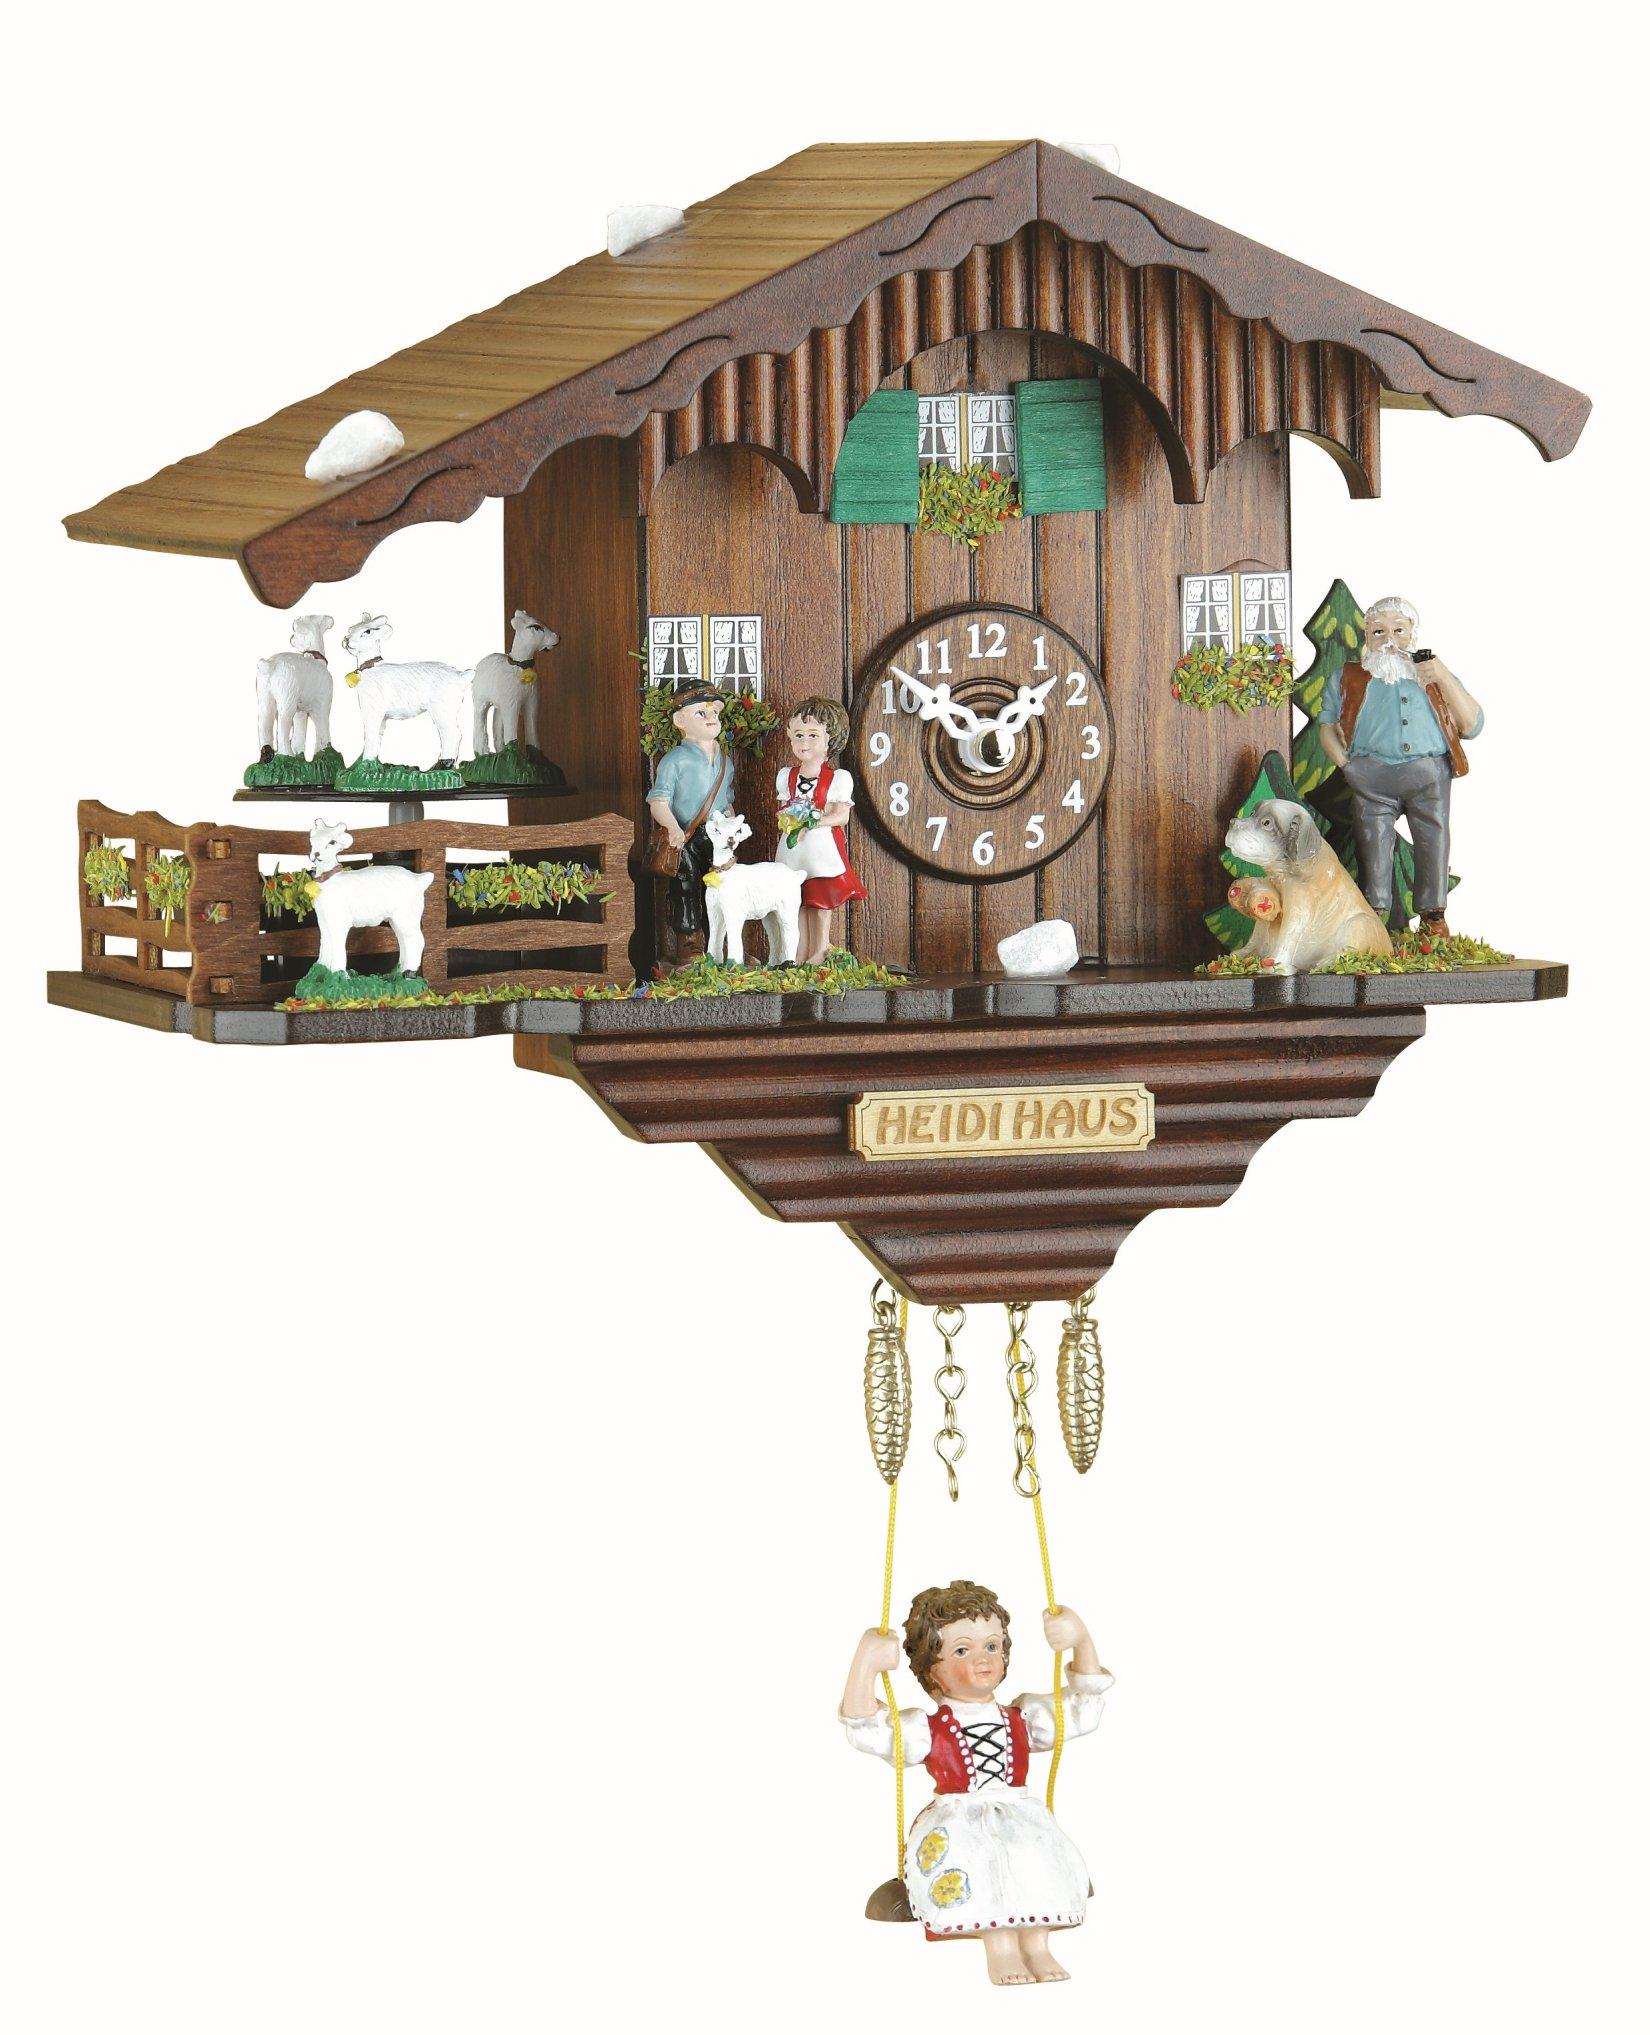 Cuckoo Clock Heidi House 'Heidi Haus'